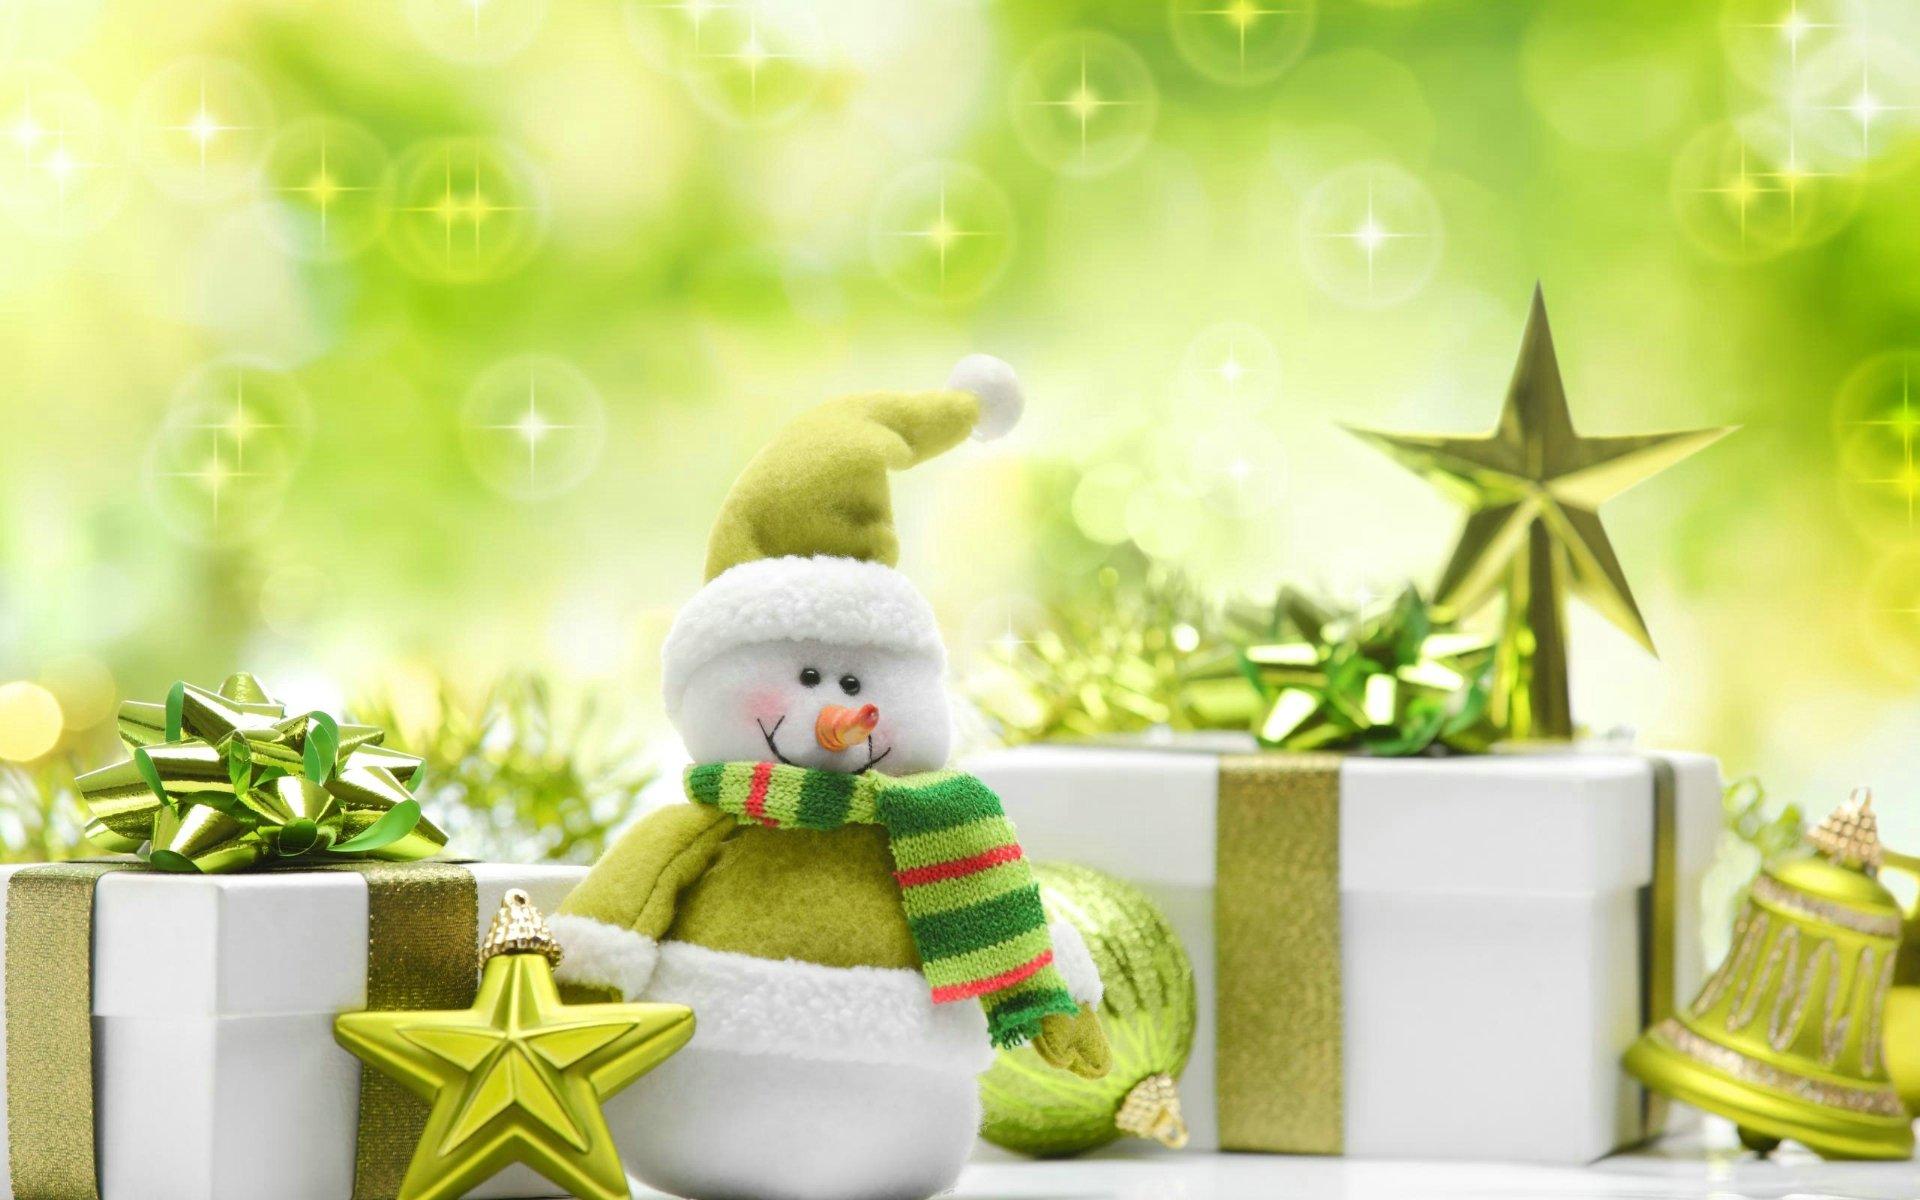 Green Christmas Presents   Wallpaper High Definition High Quality 1920x1200